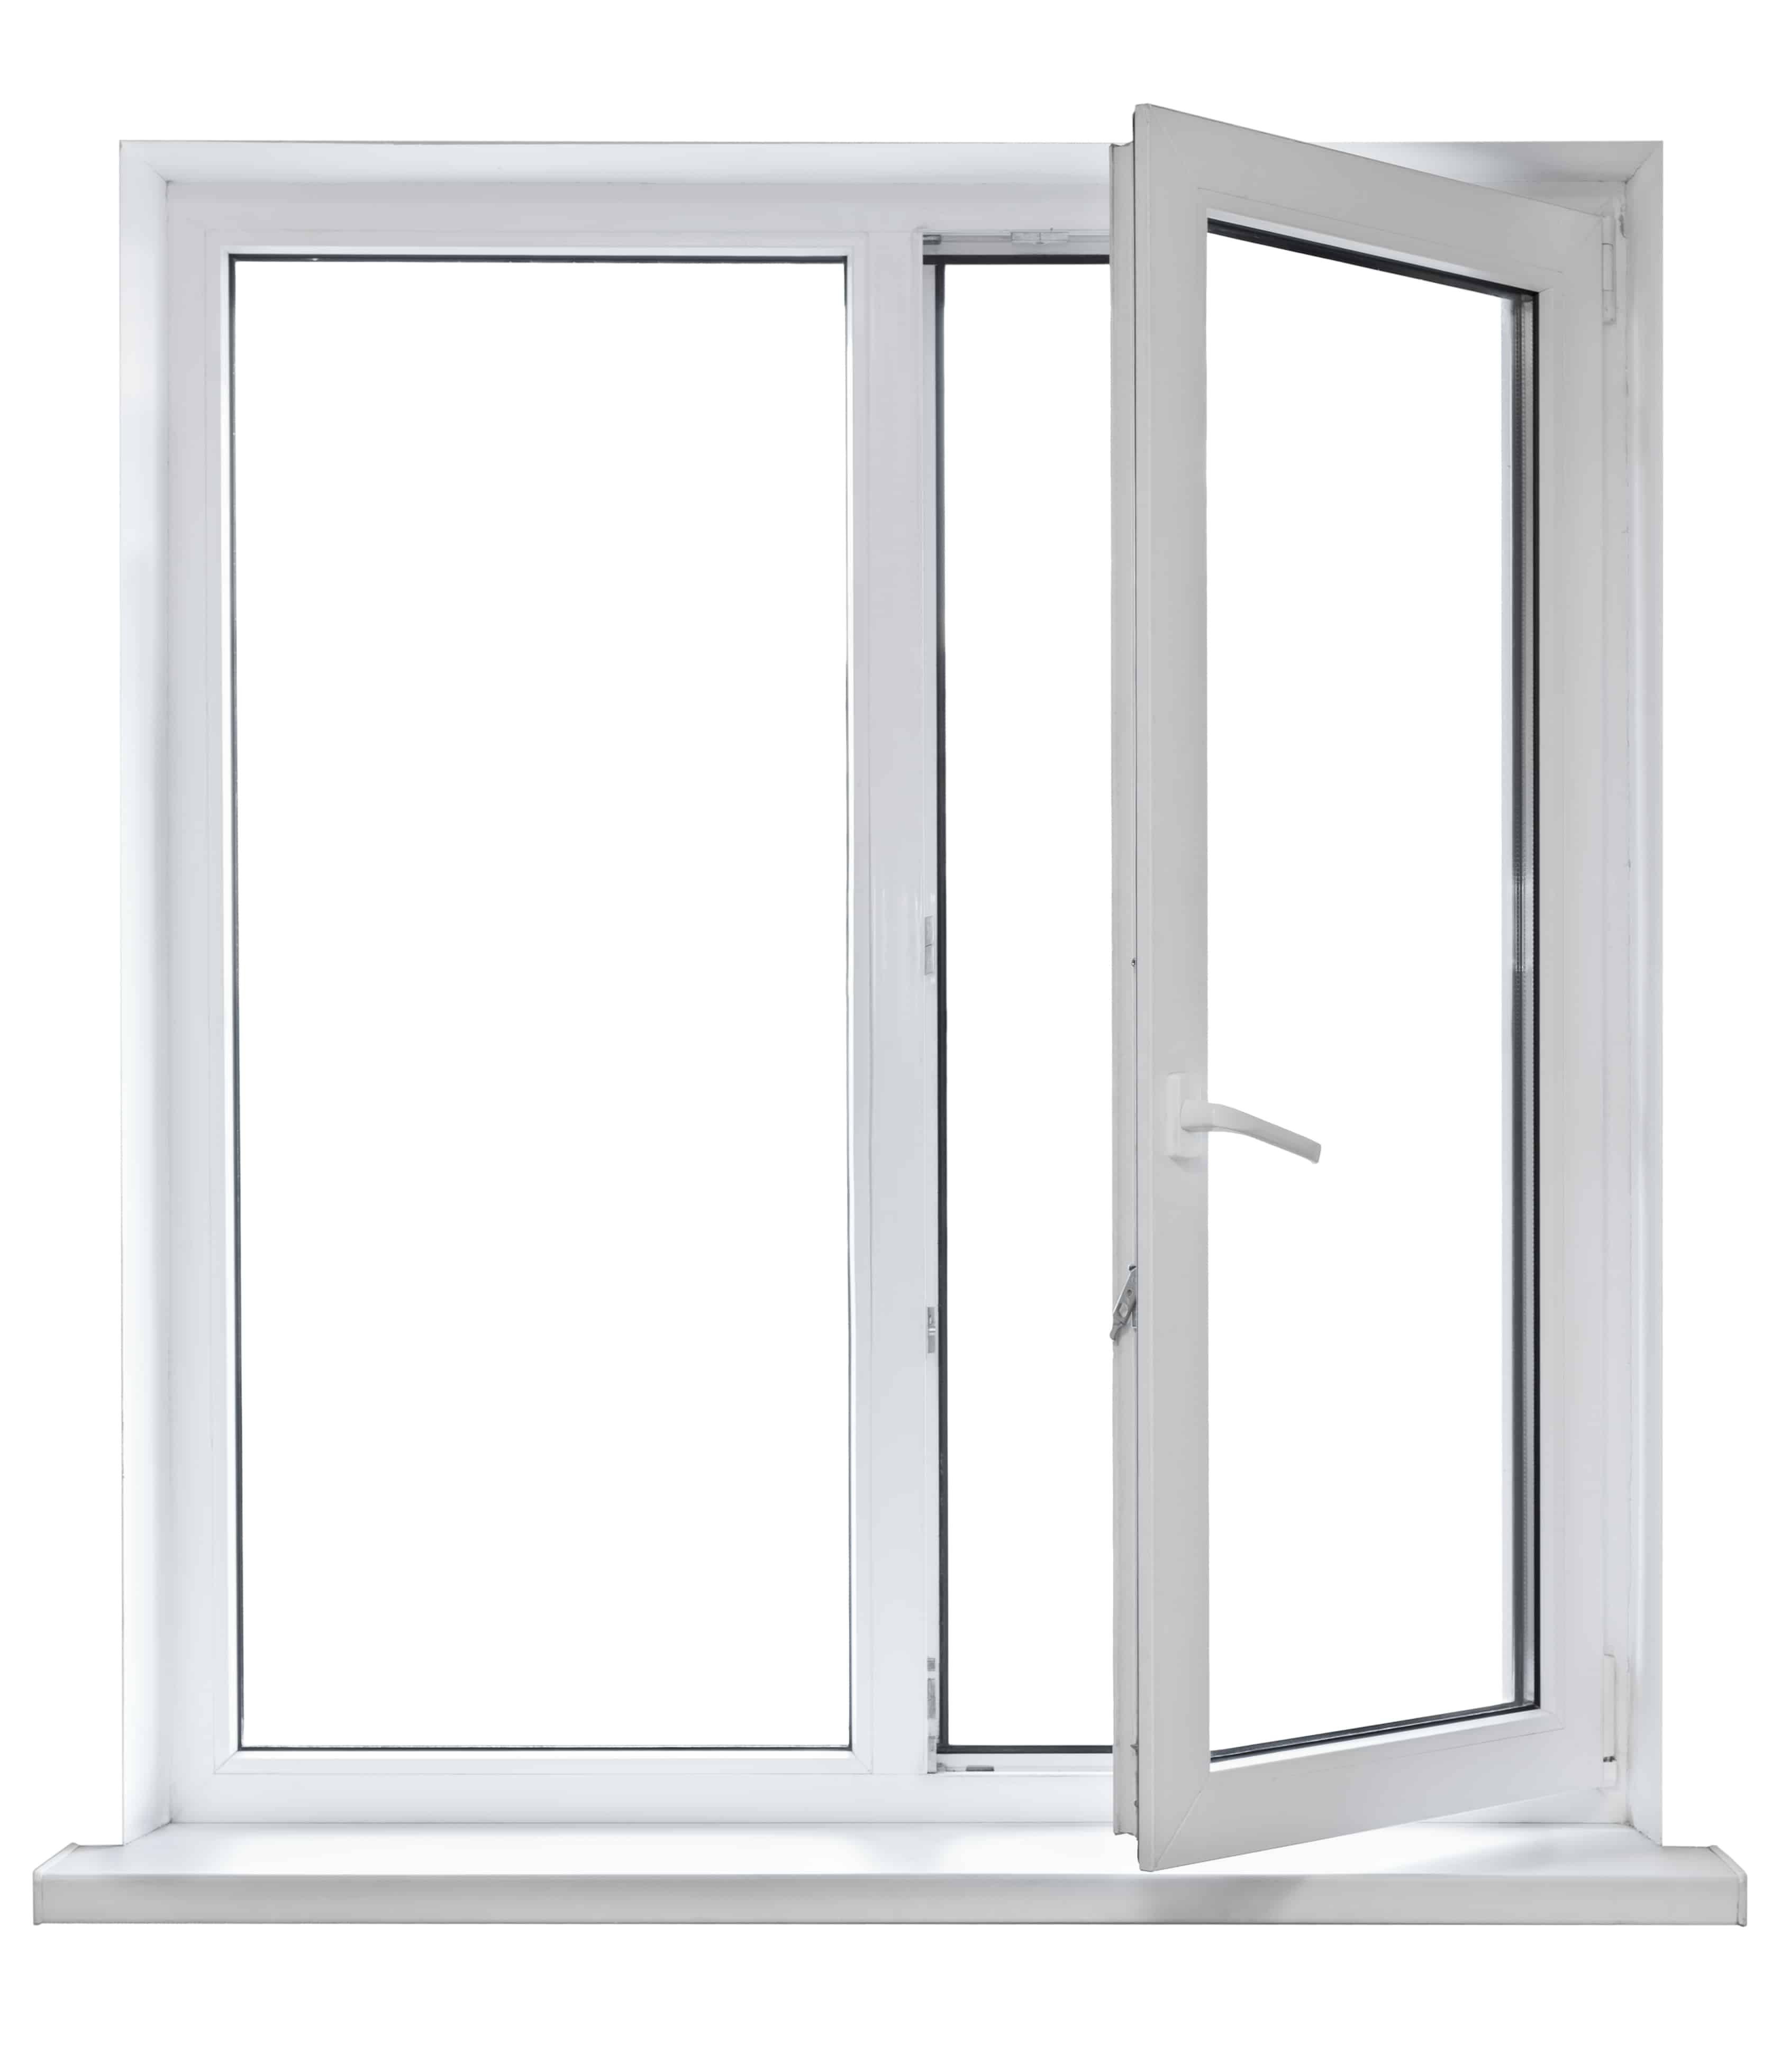 3 Simple Casement Window Air Conditioner Solutions In 2020 Window Air Conditioner Window Air Conditioner Installation Casement Window Air Conditioner